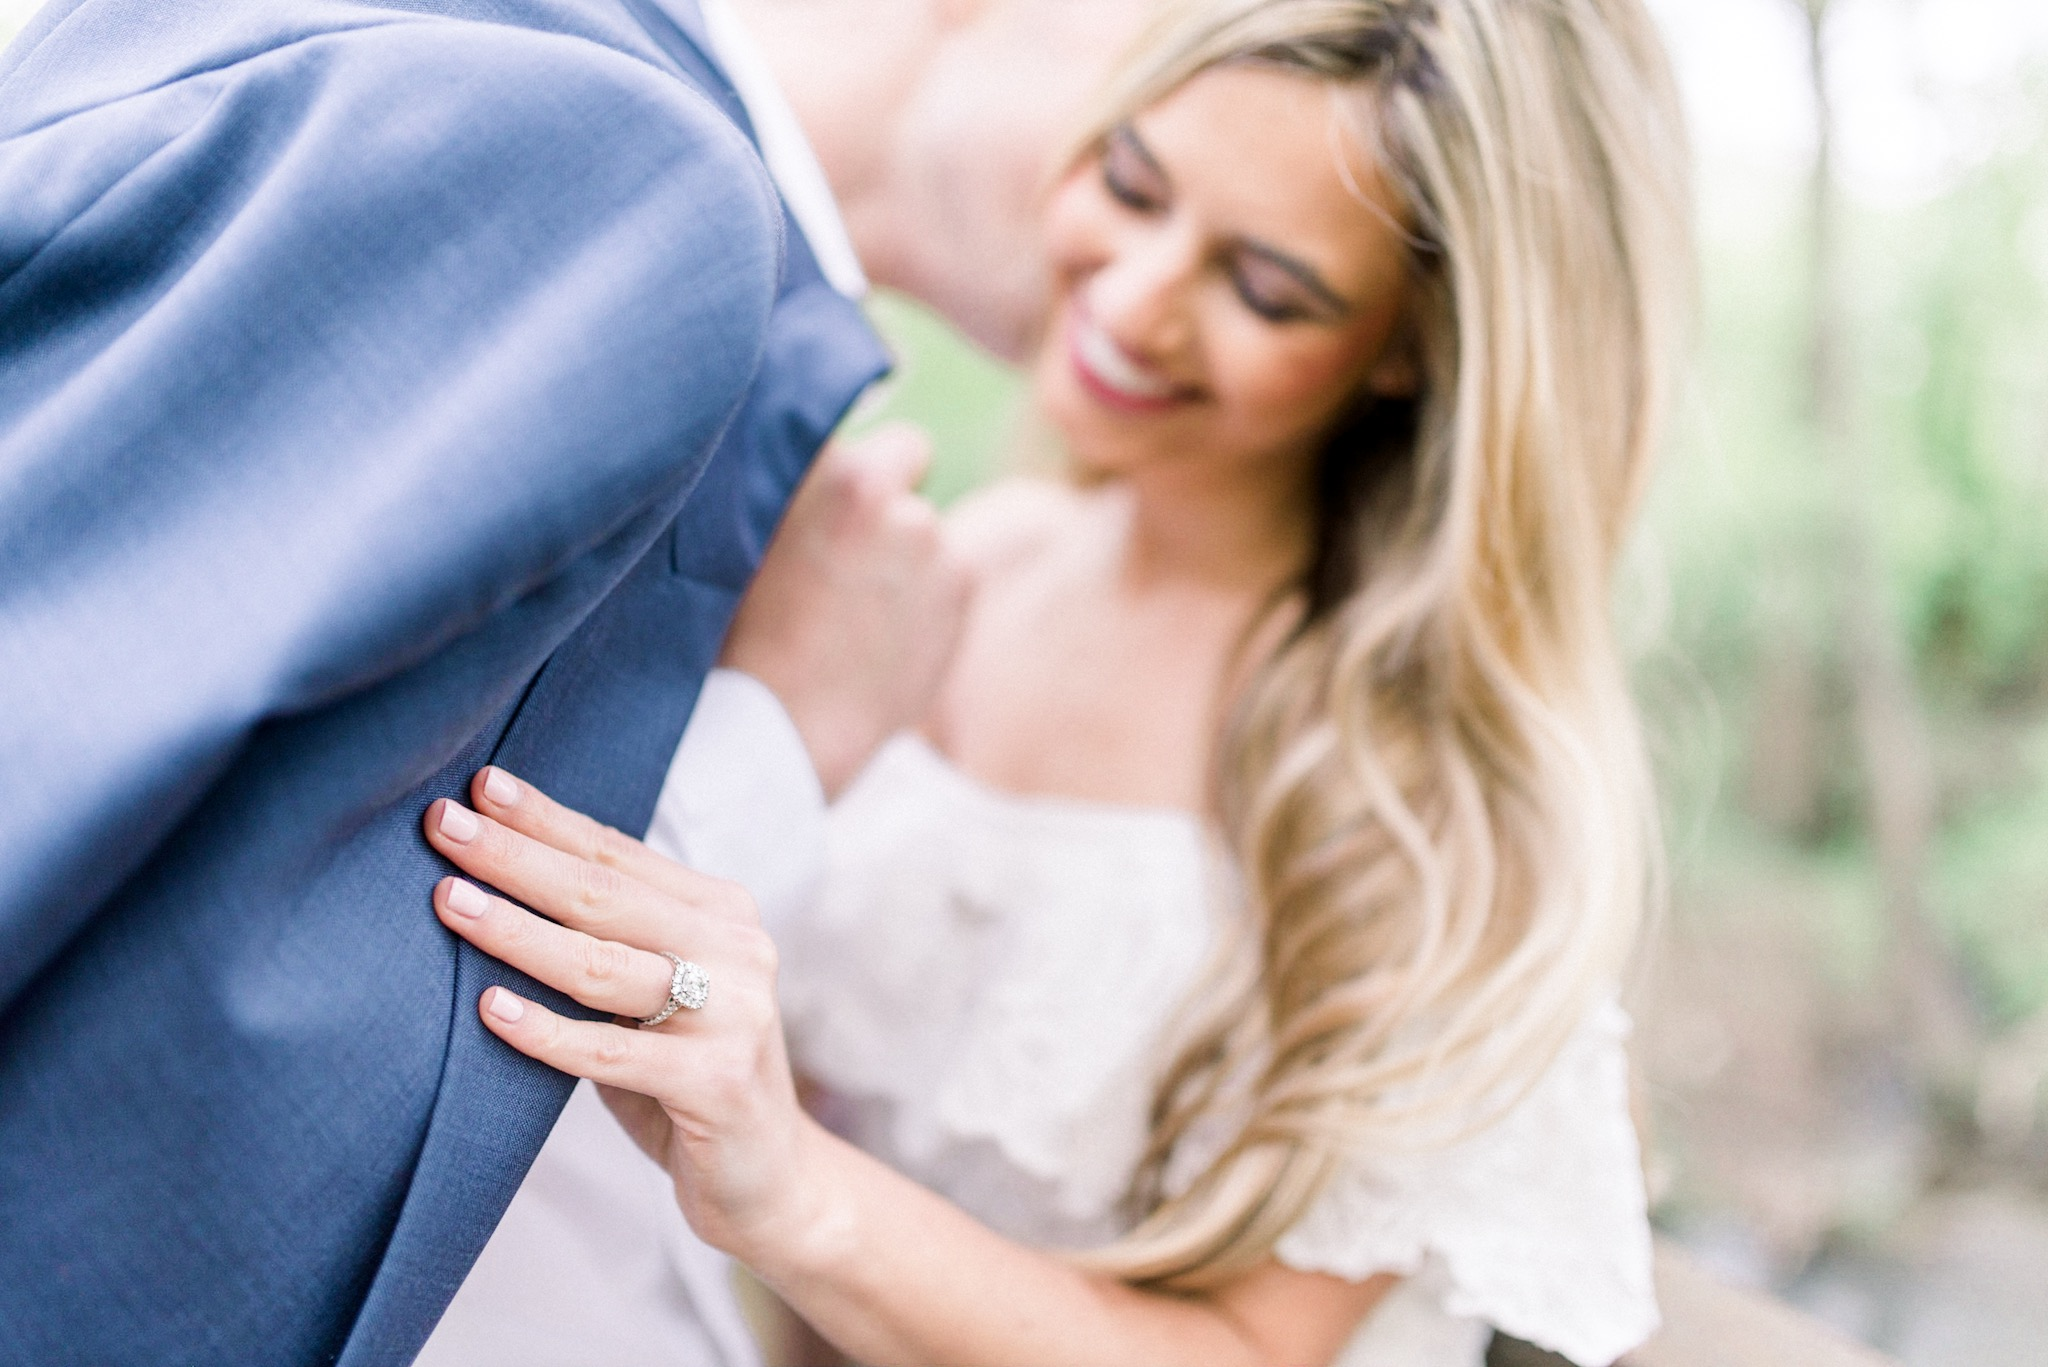 Jessica + Brayton | Romantic Engagement Photography by the Creek in Carmel Indiana | Indianapolis Wedding Photographers